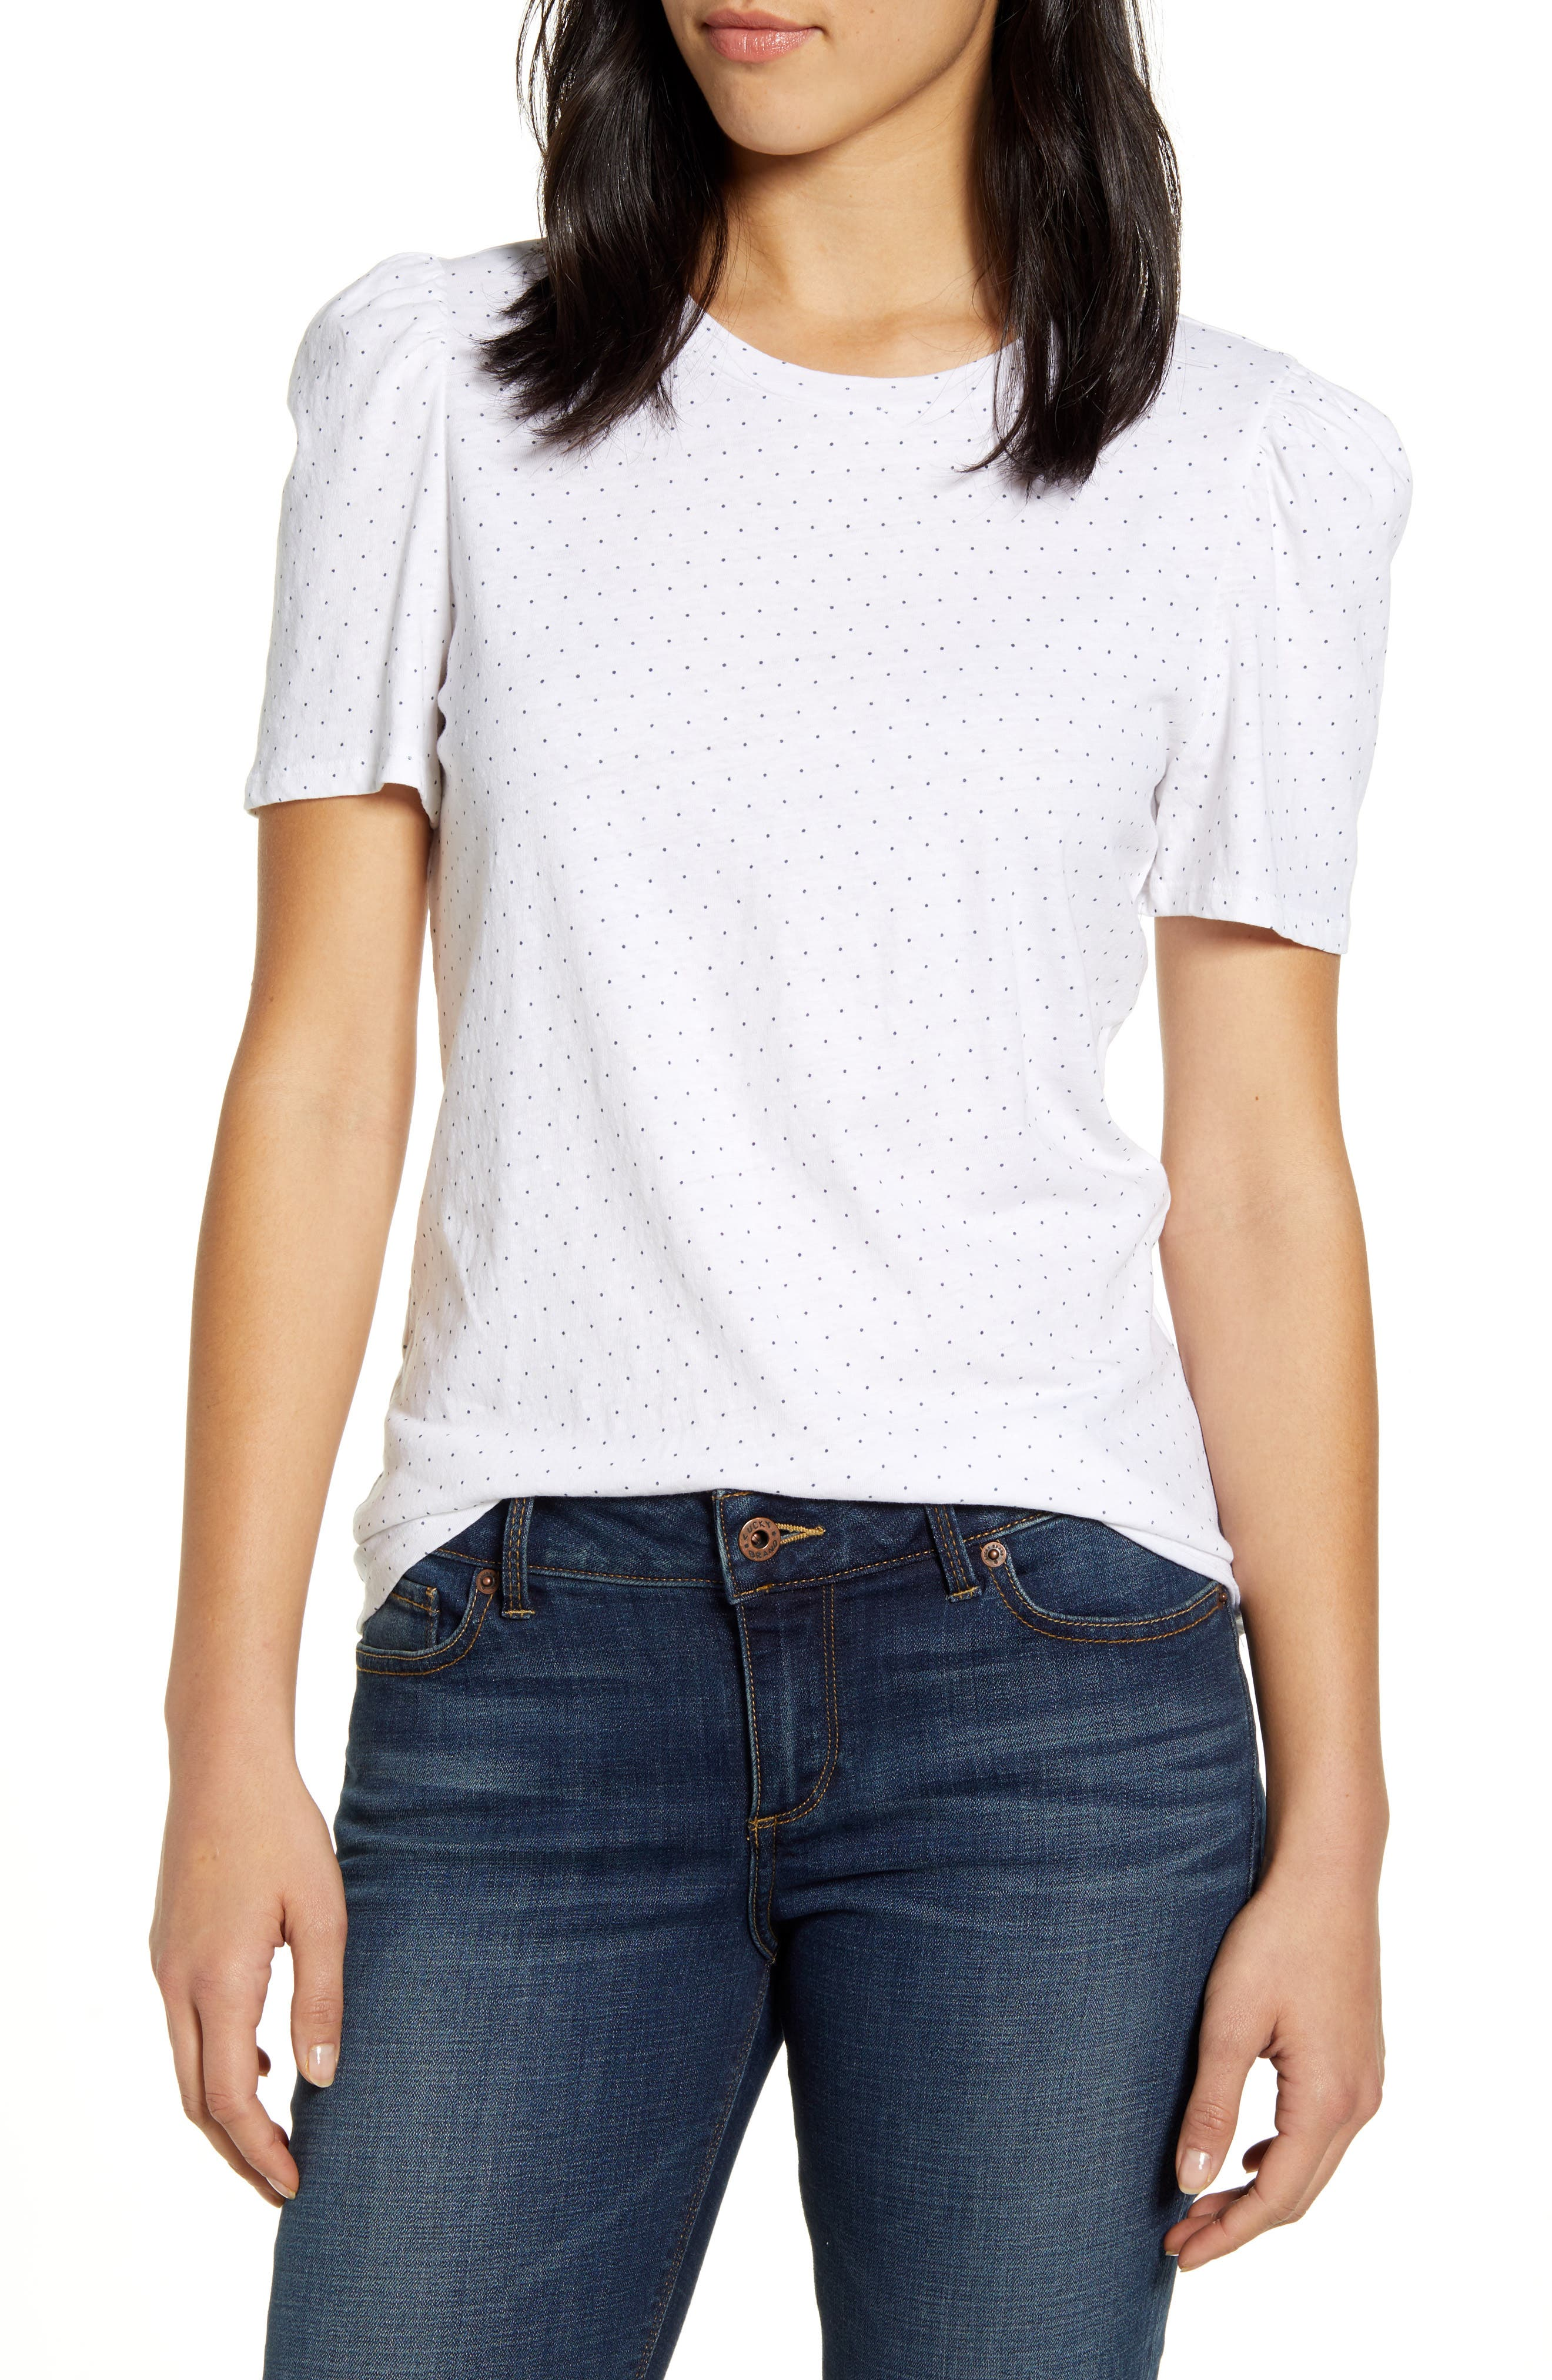 Lucky Brand Men/'s Lounge T Shirt M L XL Crew Neck Dark Grey Graphic Cotton New